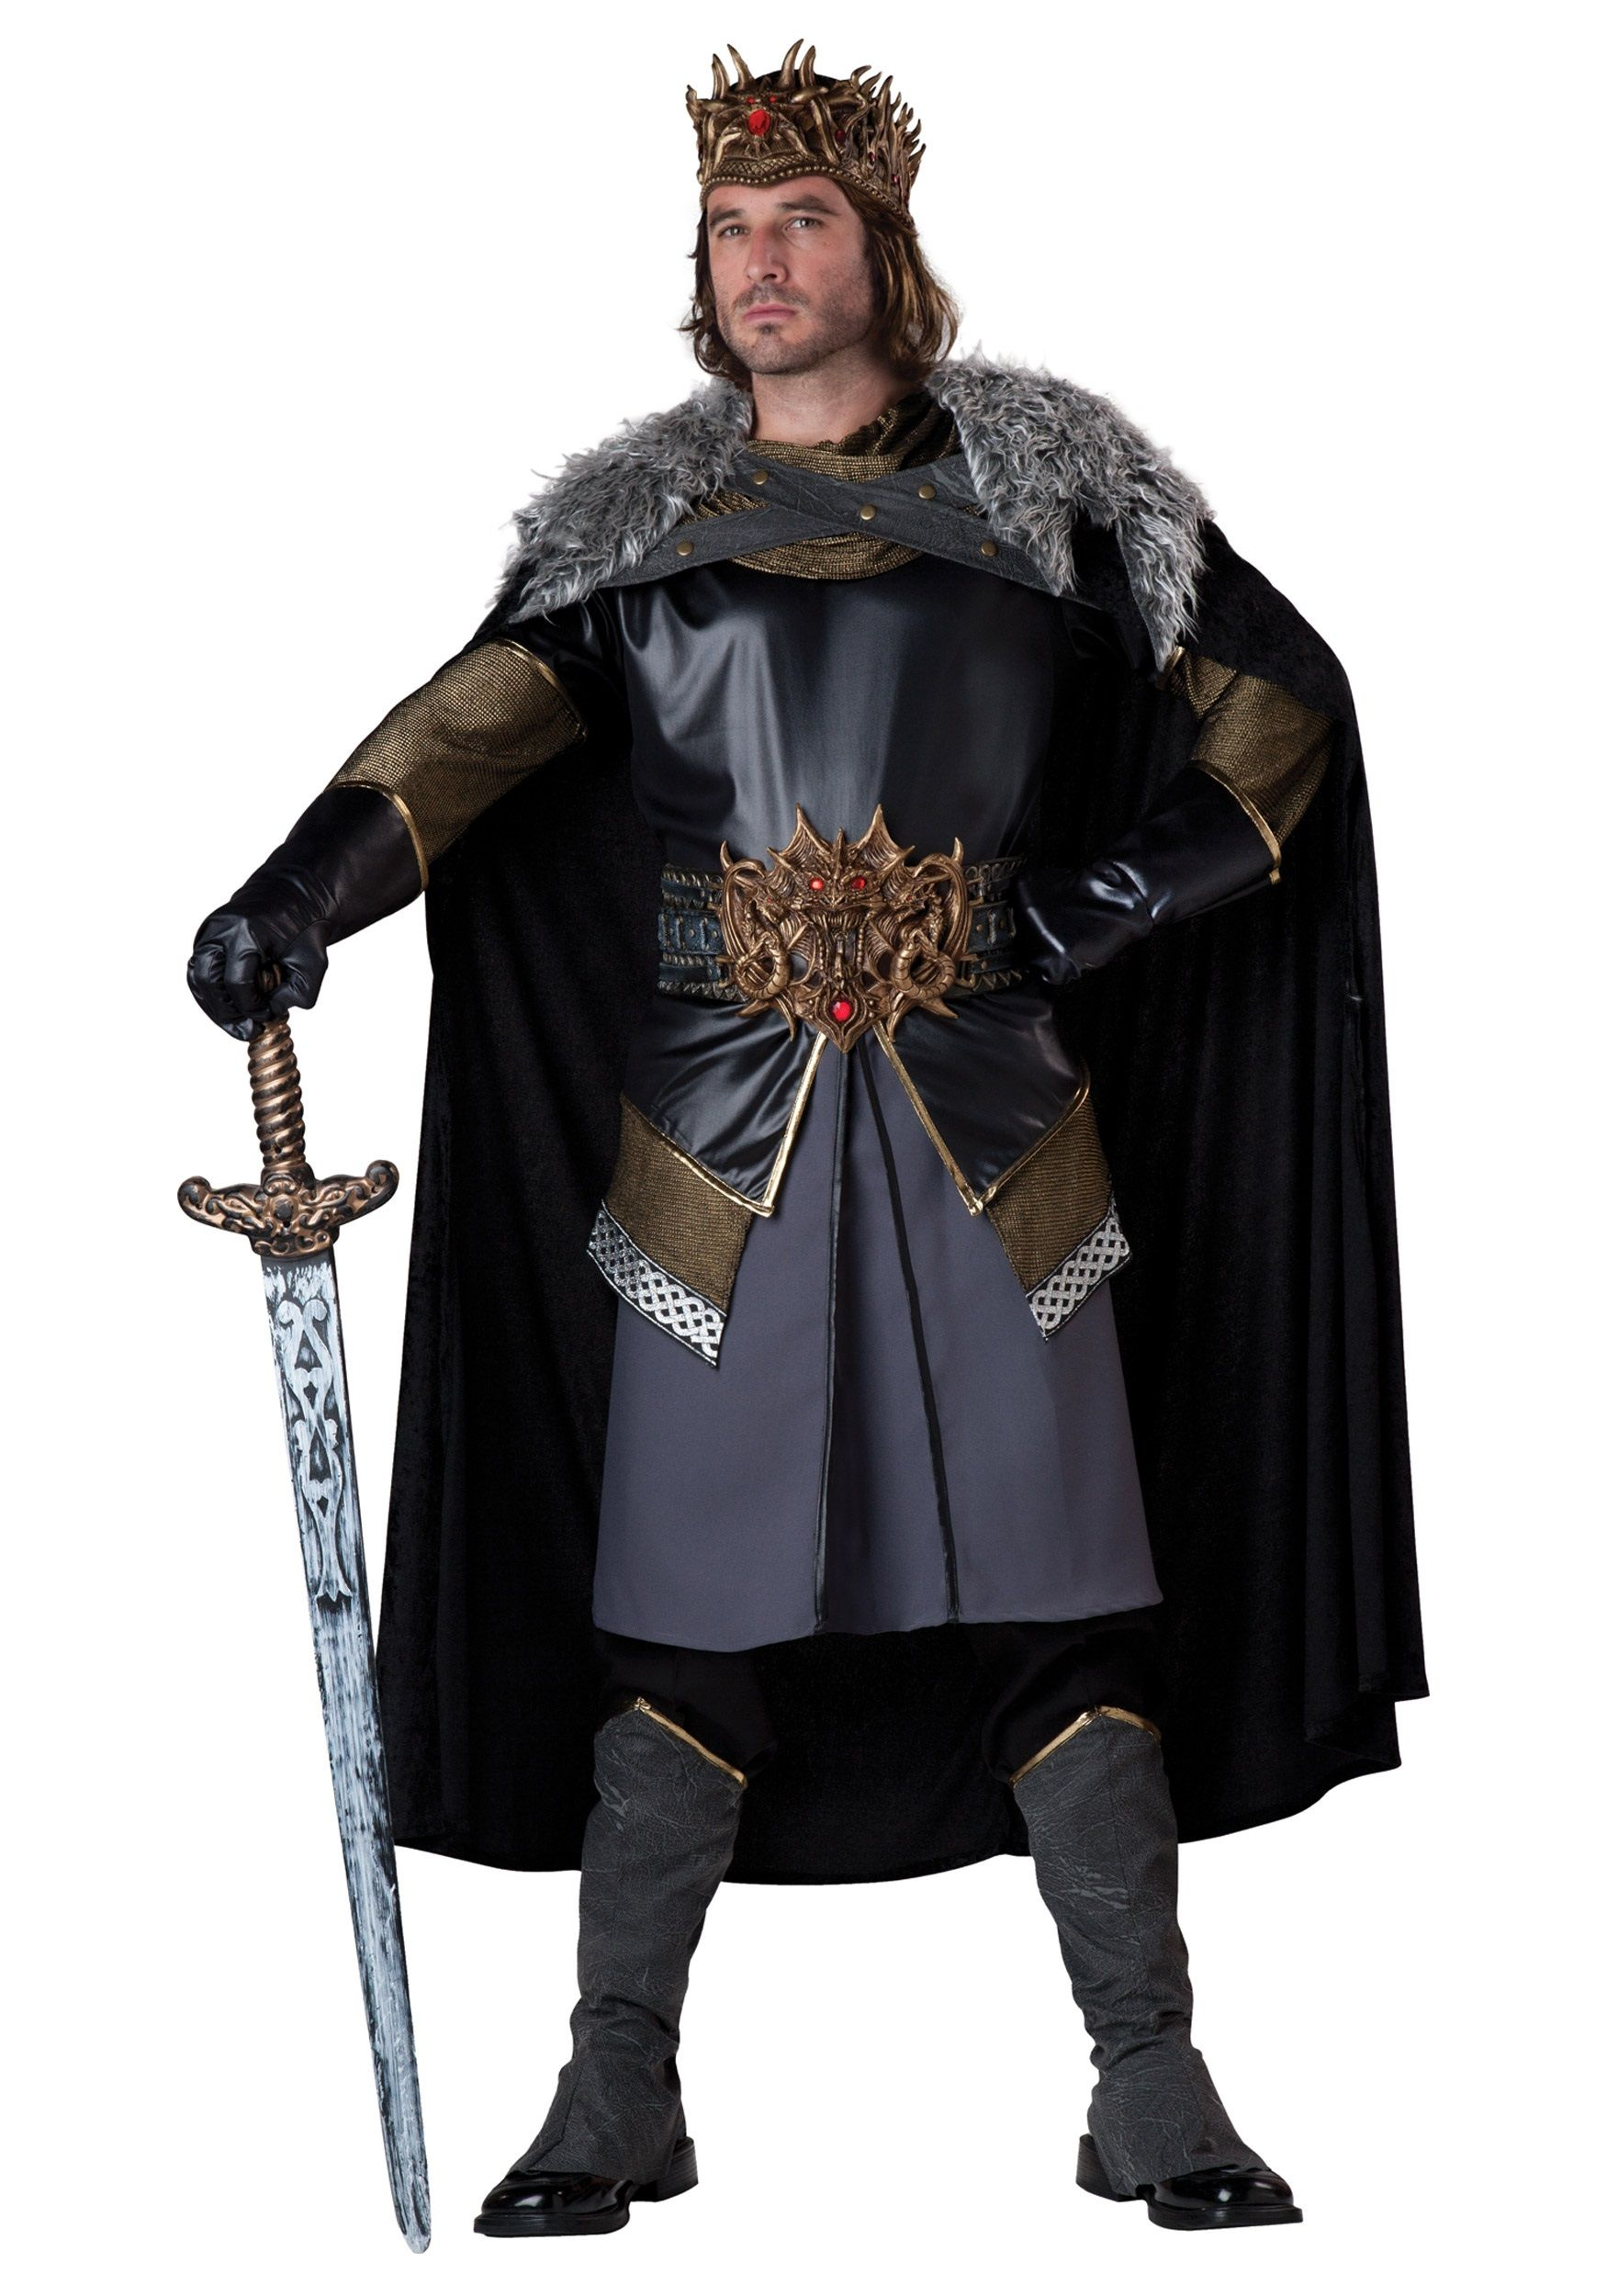 Men's King Arthur Costume - This is an elaborate King Arthur ...